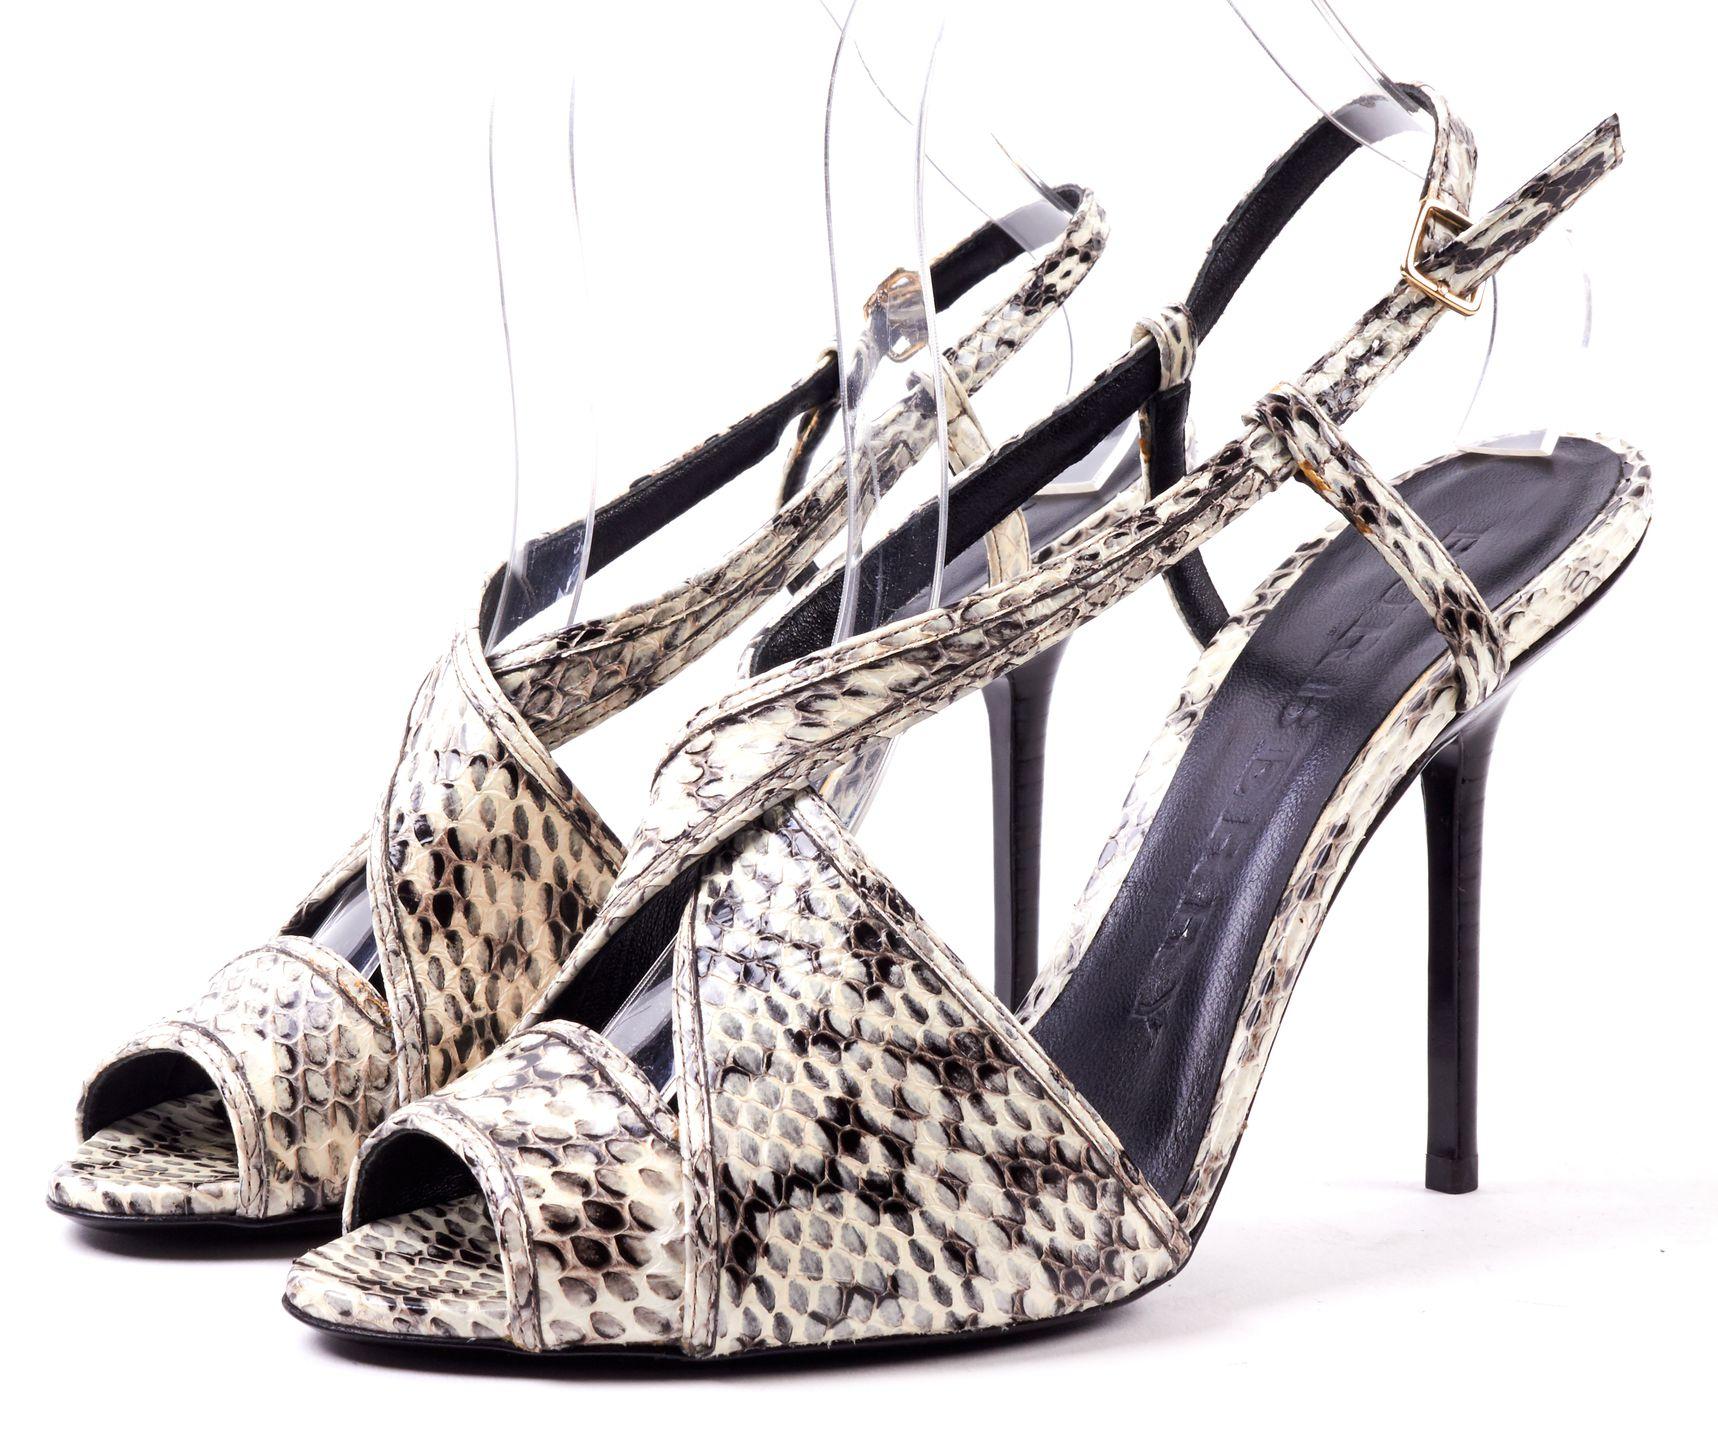 BURBERRY White Black Snake Embossed Leather Cris Cross Heel Sandals